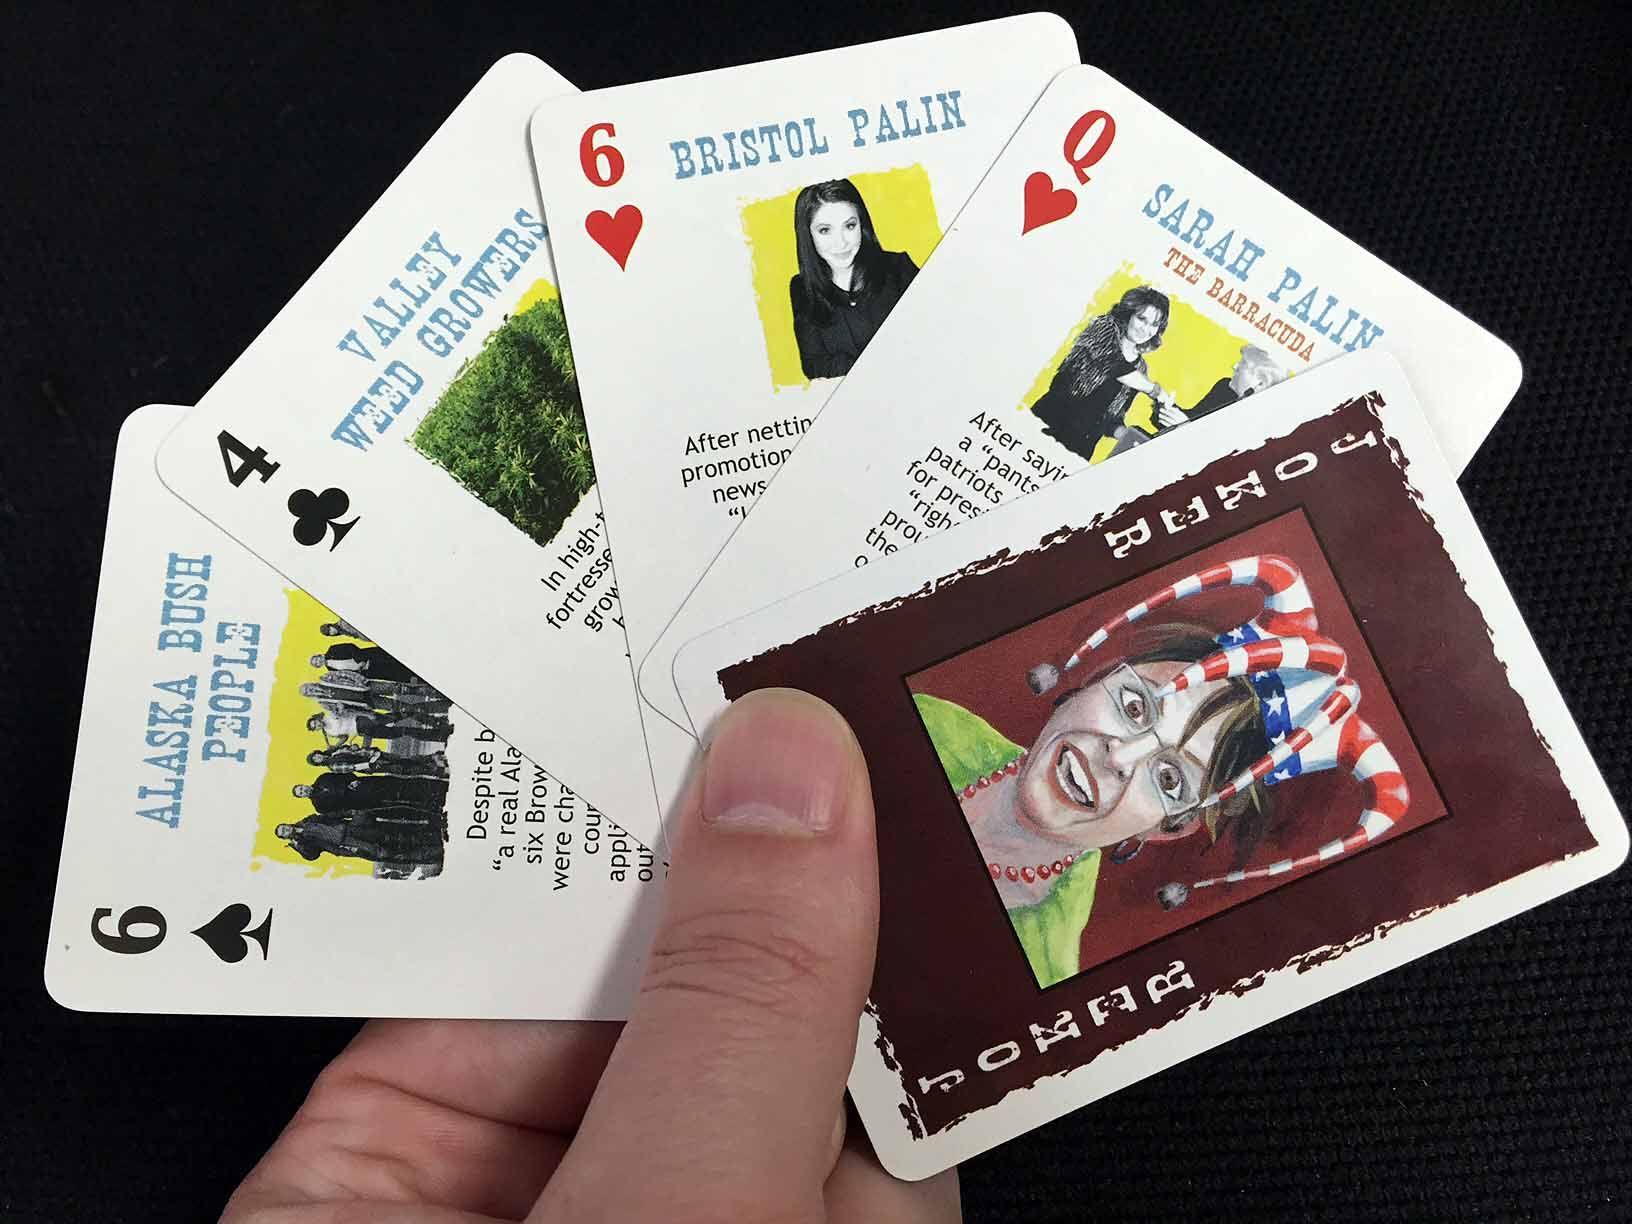 Manly Palin Playing Cards Palins Again Make Cut On Alaska Playing Cards Local News Make Playing Cards Reviews Make Playing Cards Online To Print cards Make Playing Cards